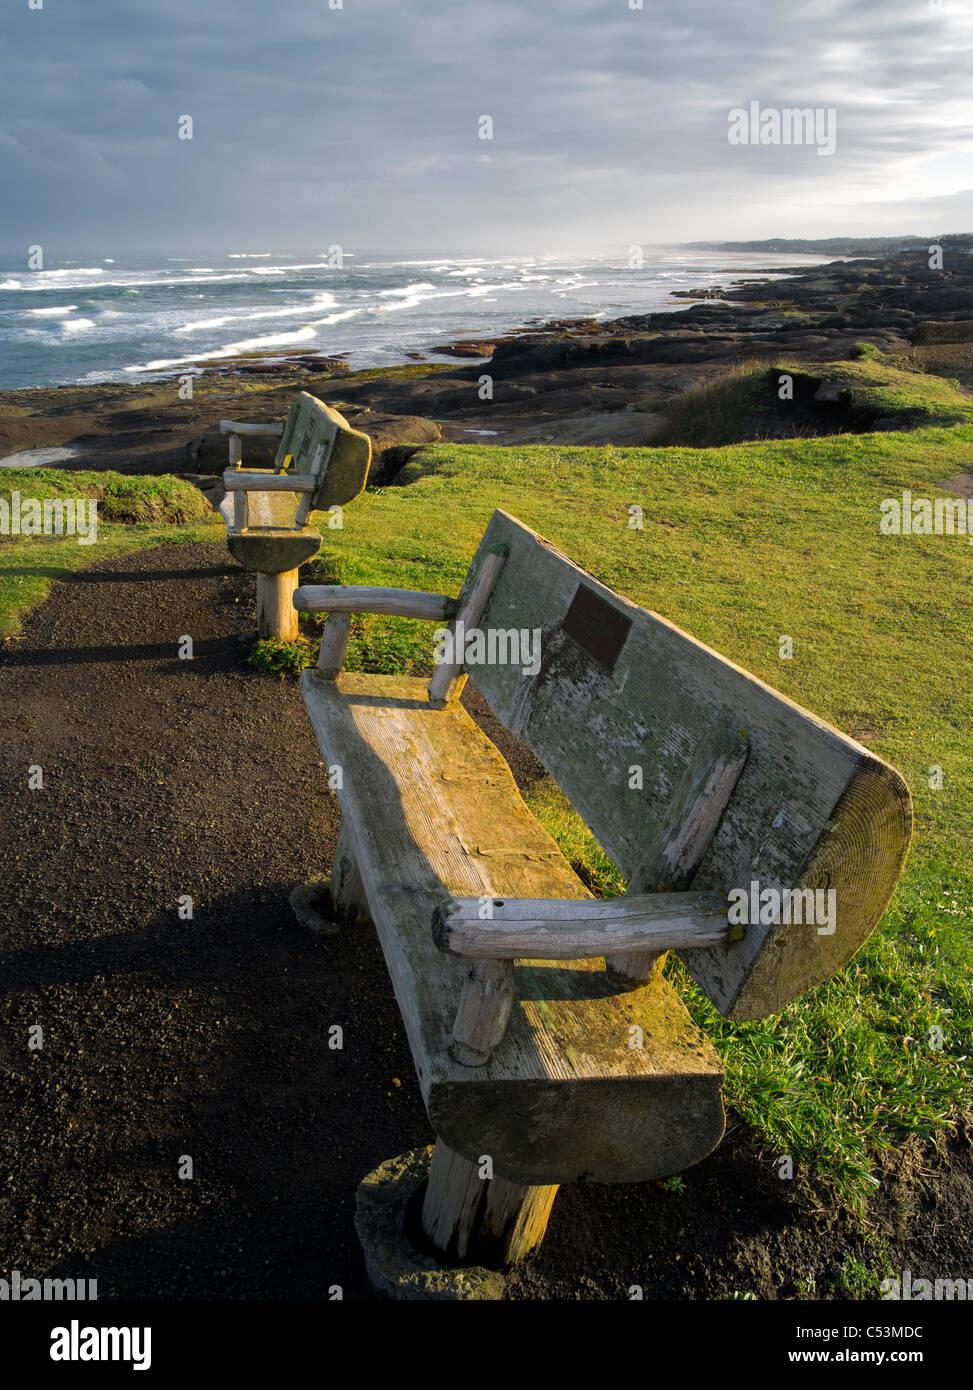 Benches at Smelt Sands State Park, Oregon - Stock Image